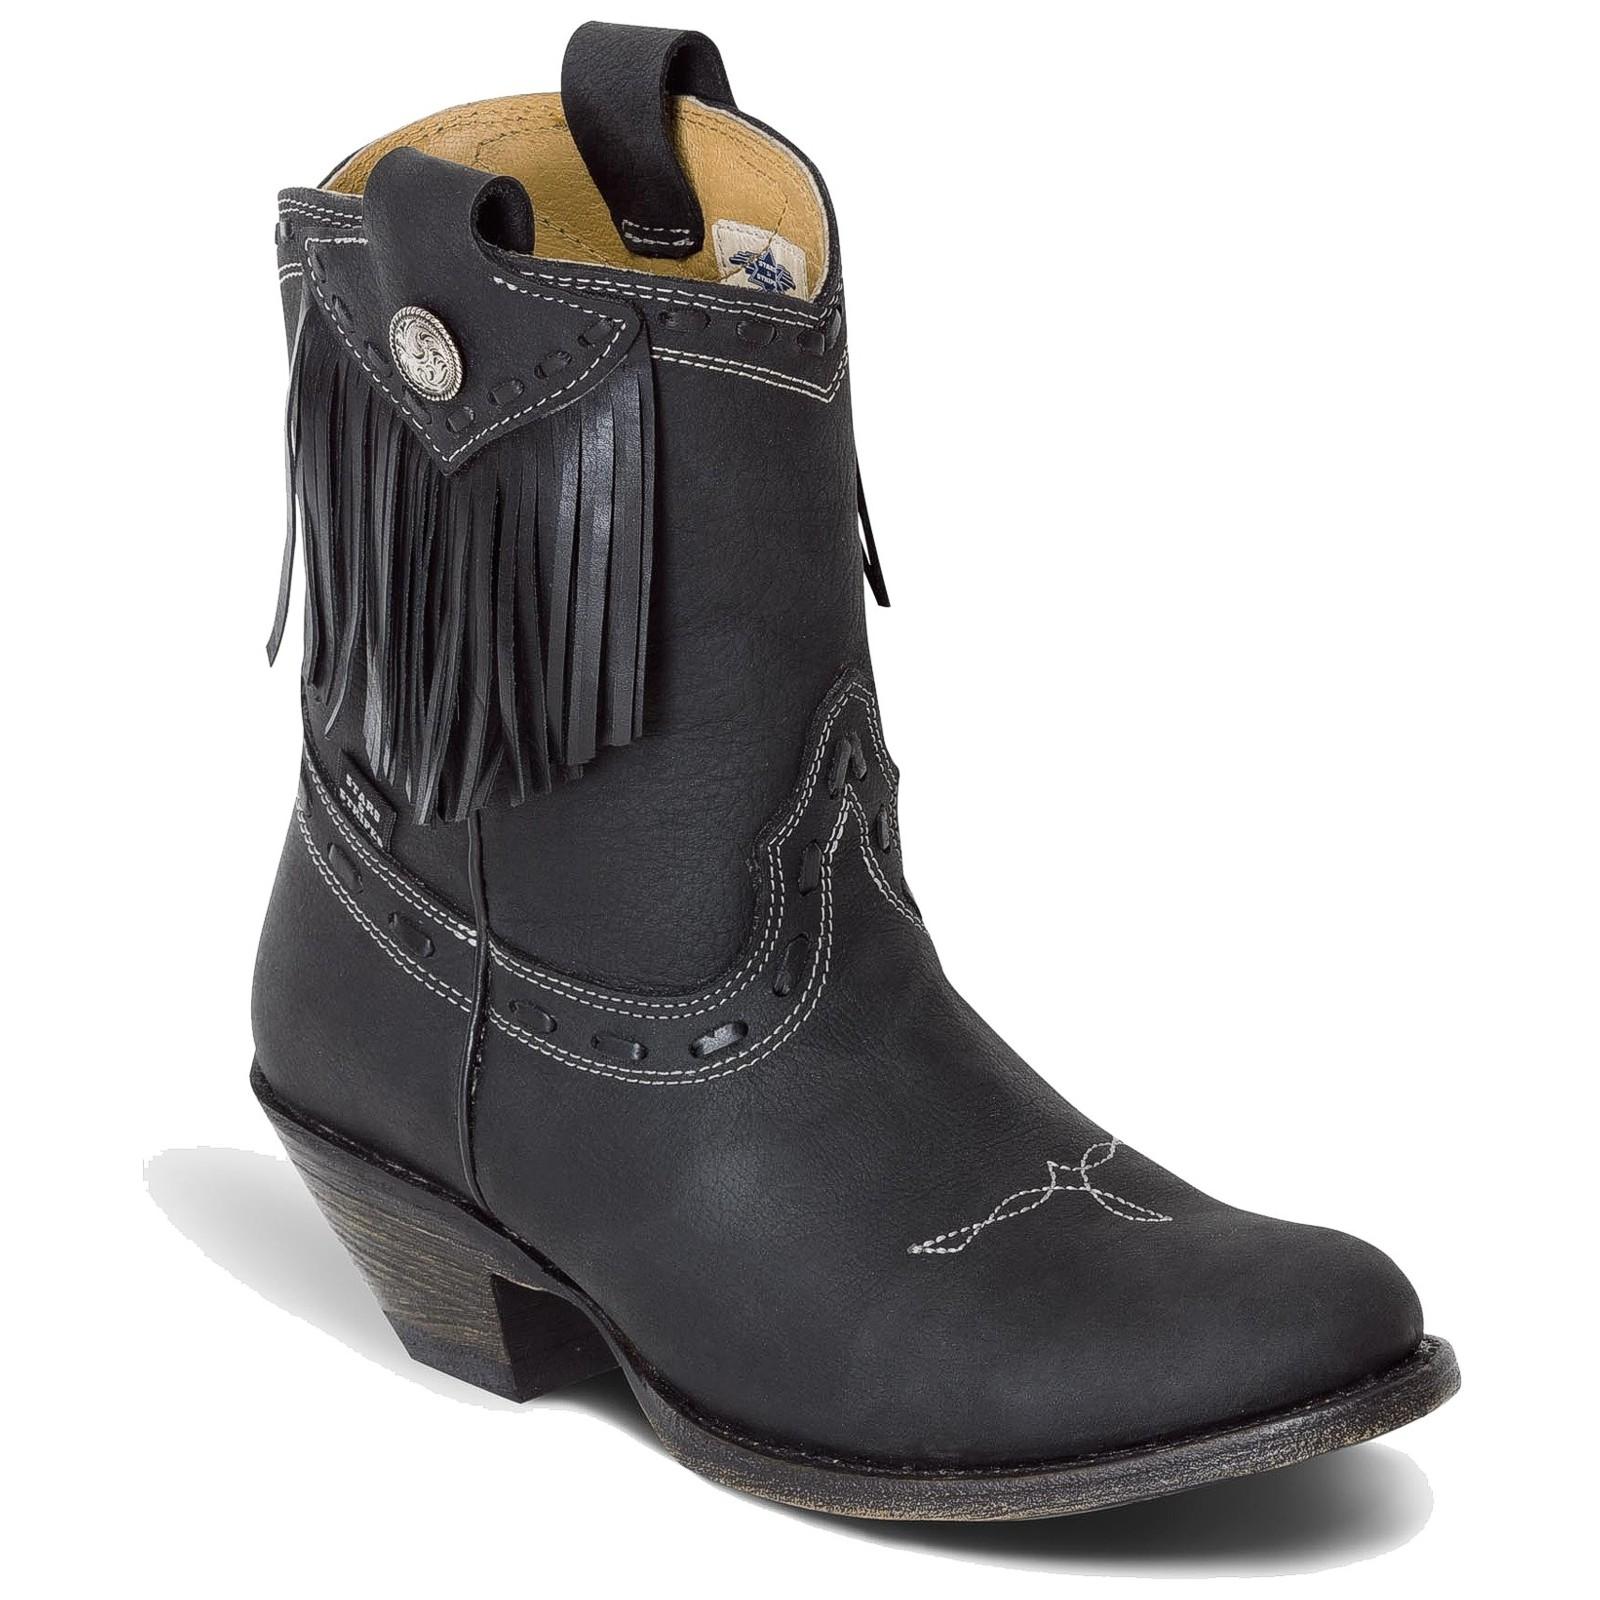 Stars & Stripes Damen Stiefel Western Boots »WBL-32« Schwarz